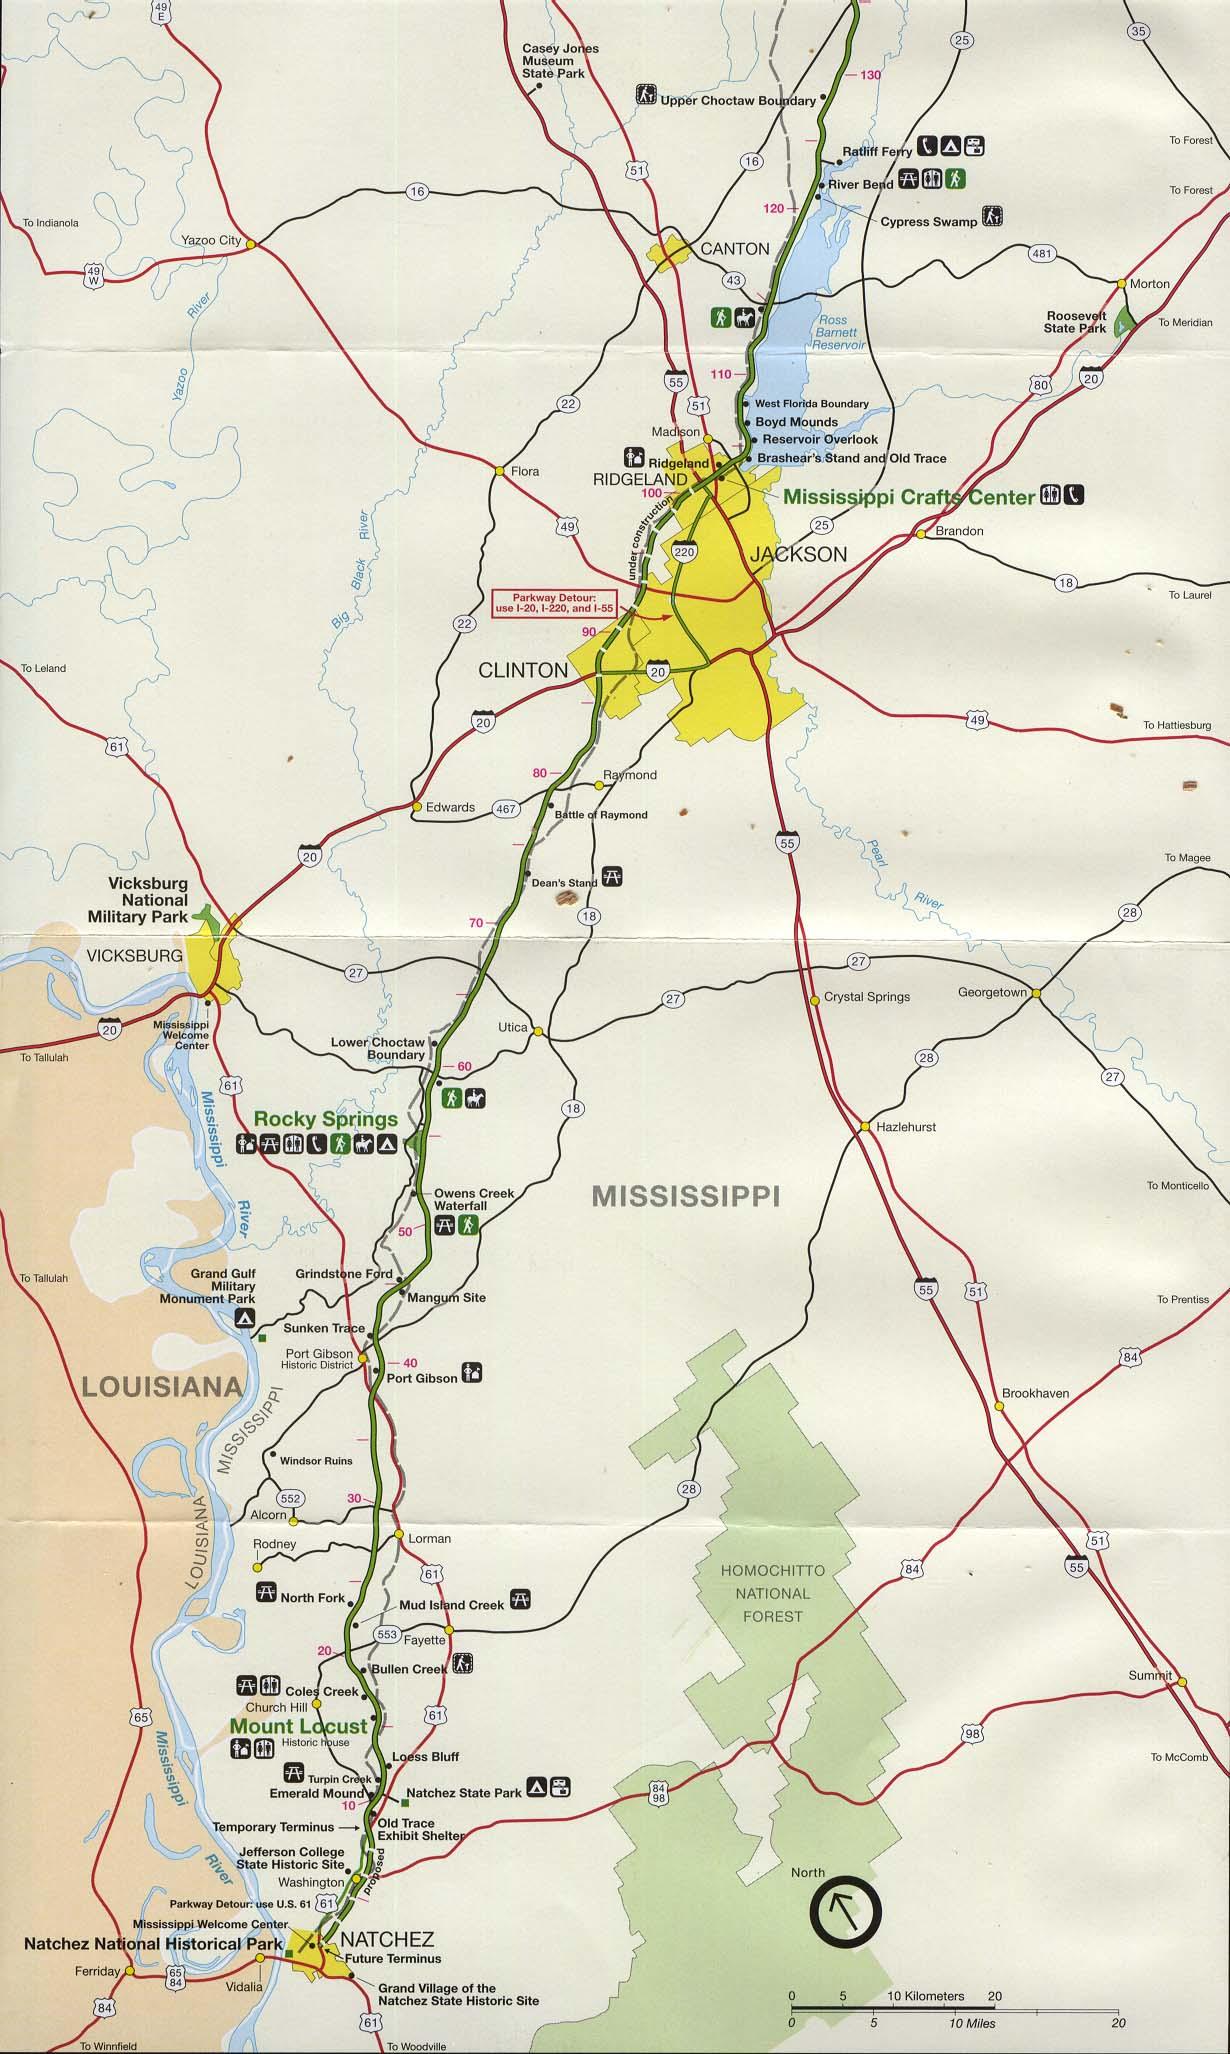 Free Download Alabama National Park Maps